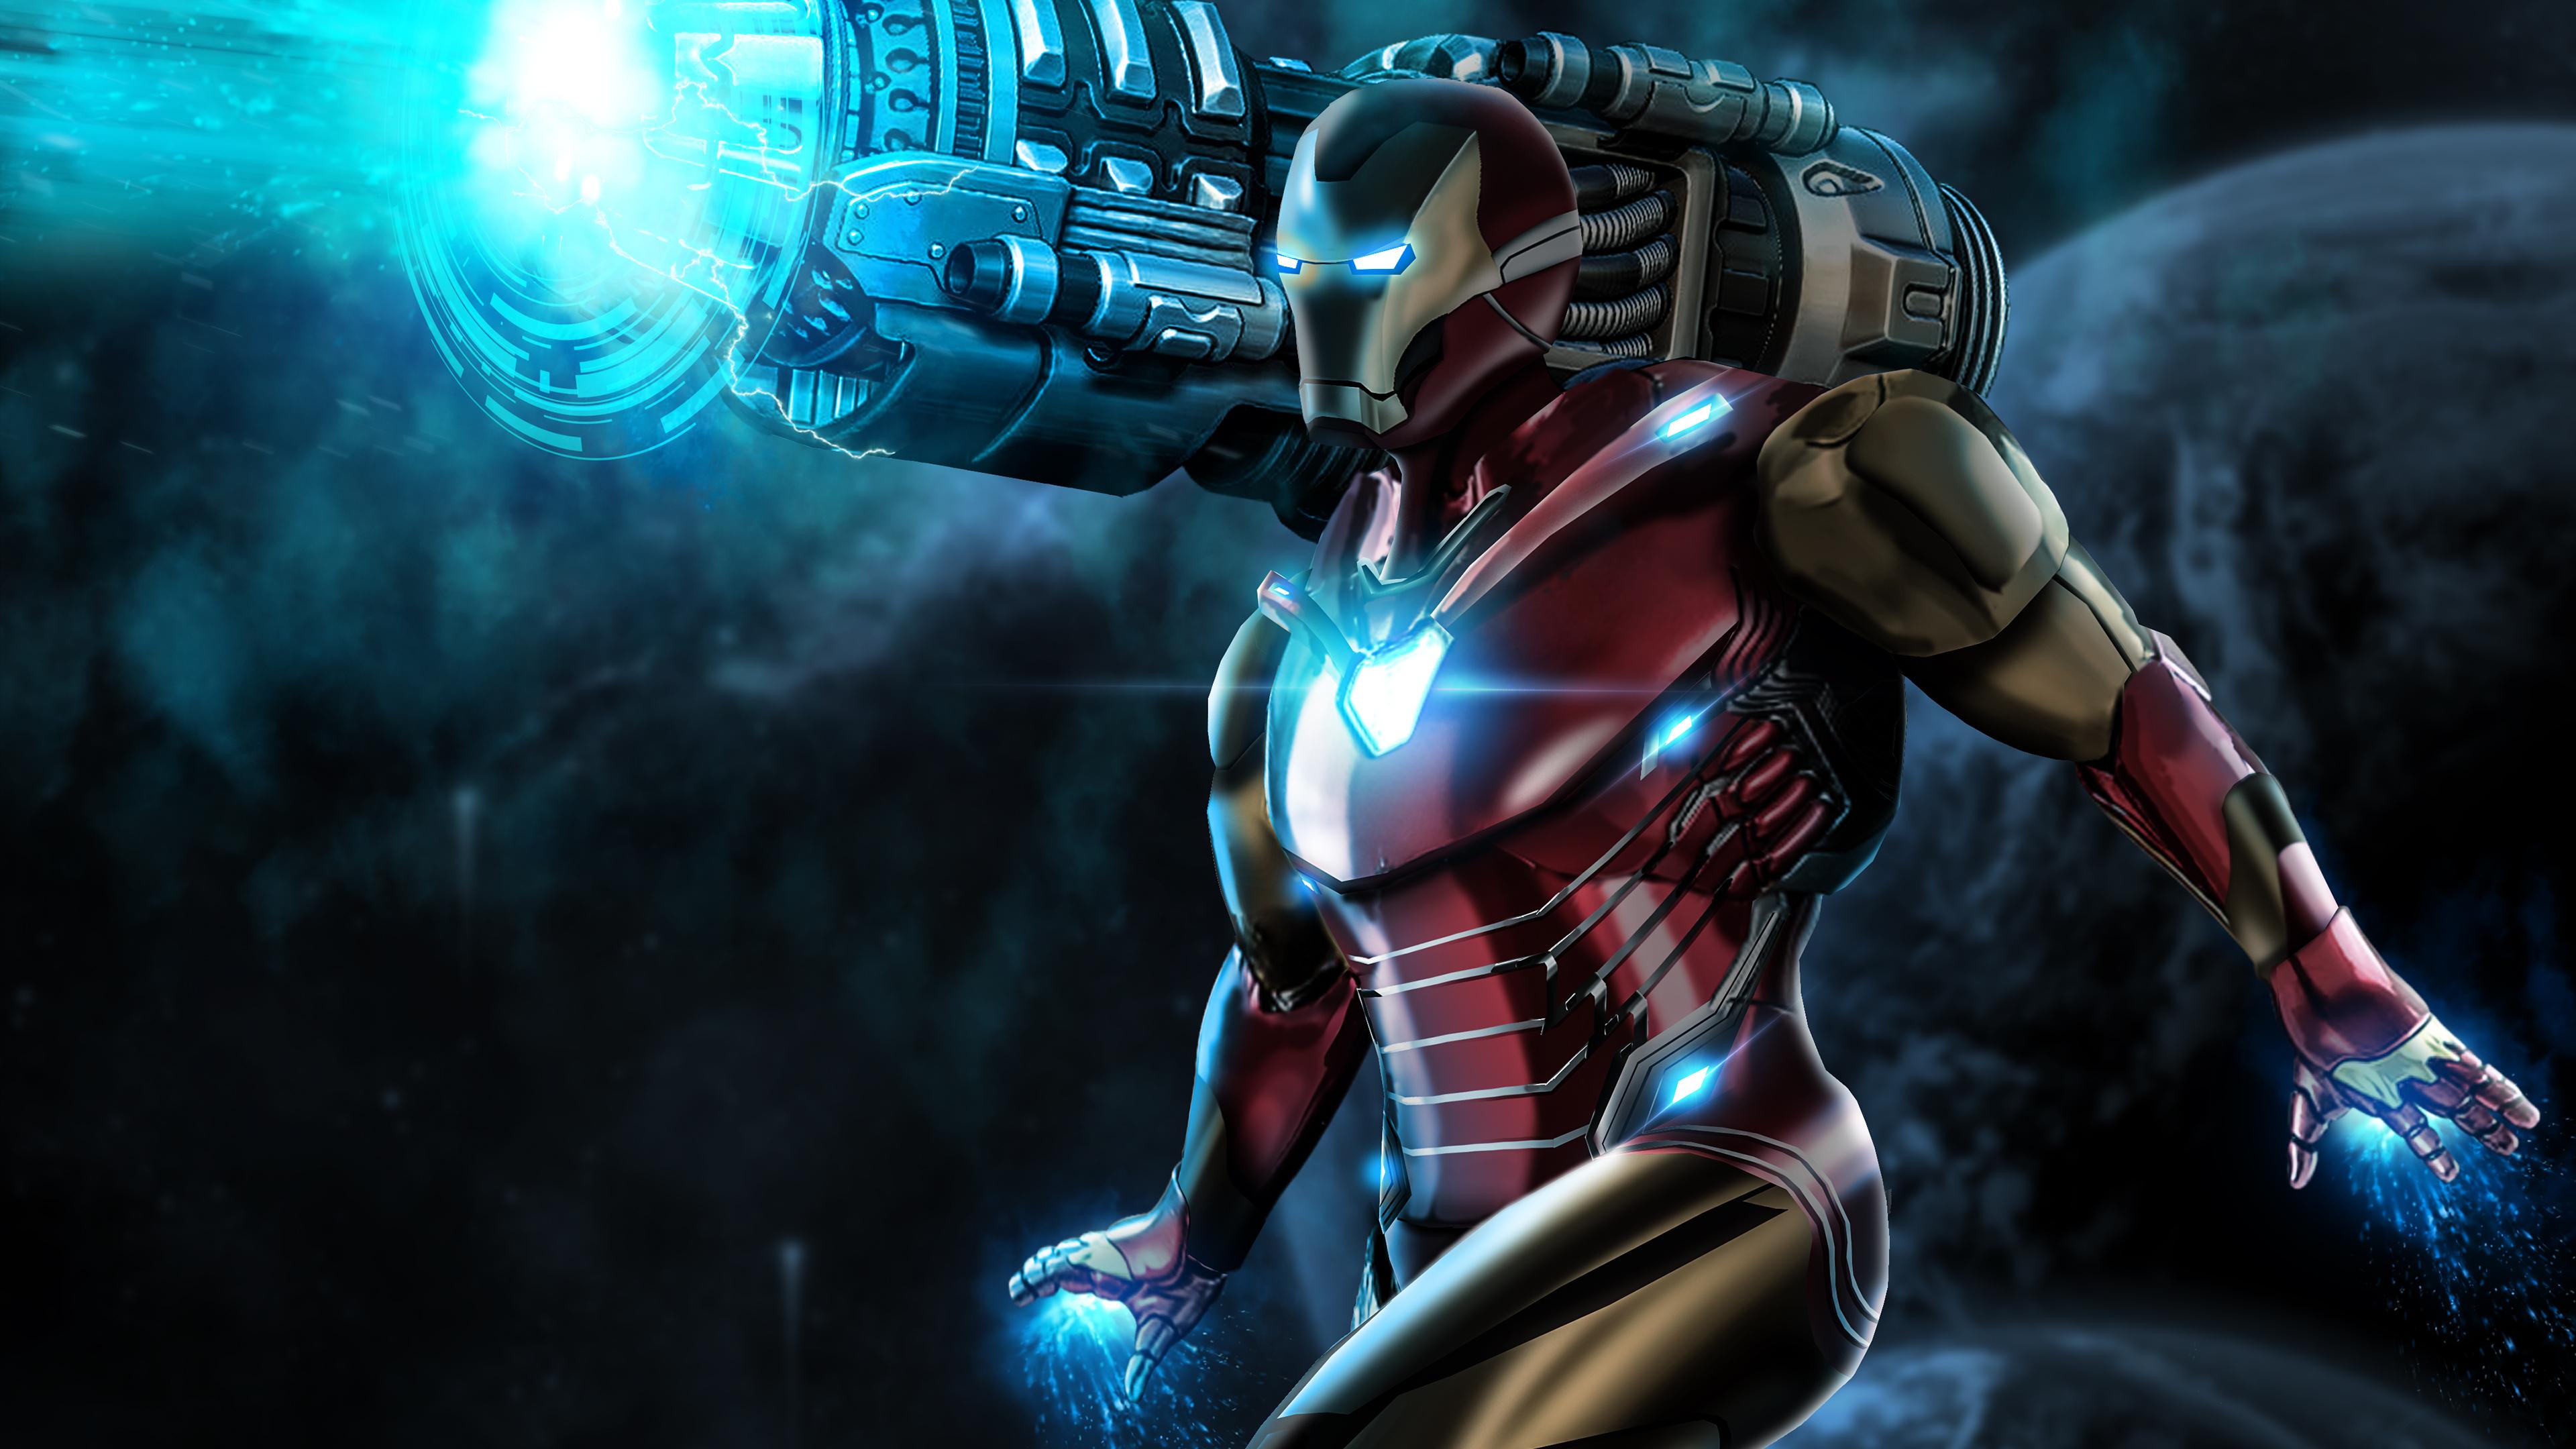 iron man proton cannon 4k 1553072158 - Iron Man Proton Cannon 4k - superheroes wallpapers, iron man wallpapers, hd-wallpapers, digital art wallpapers, behance wallpapers, artwork wallpapers